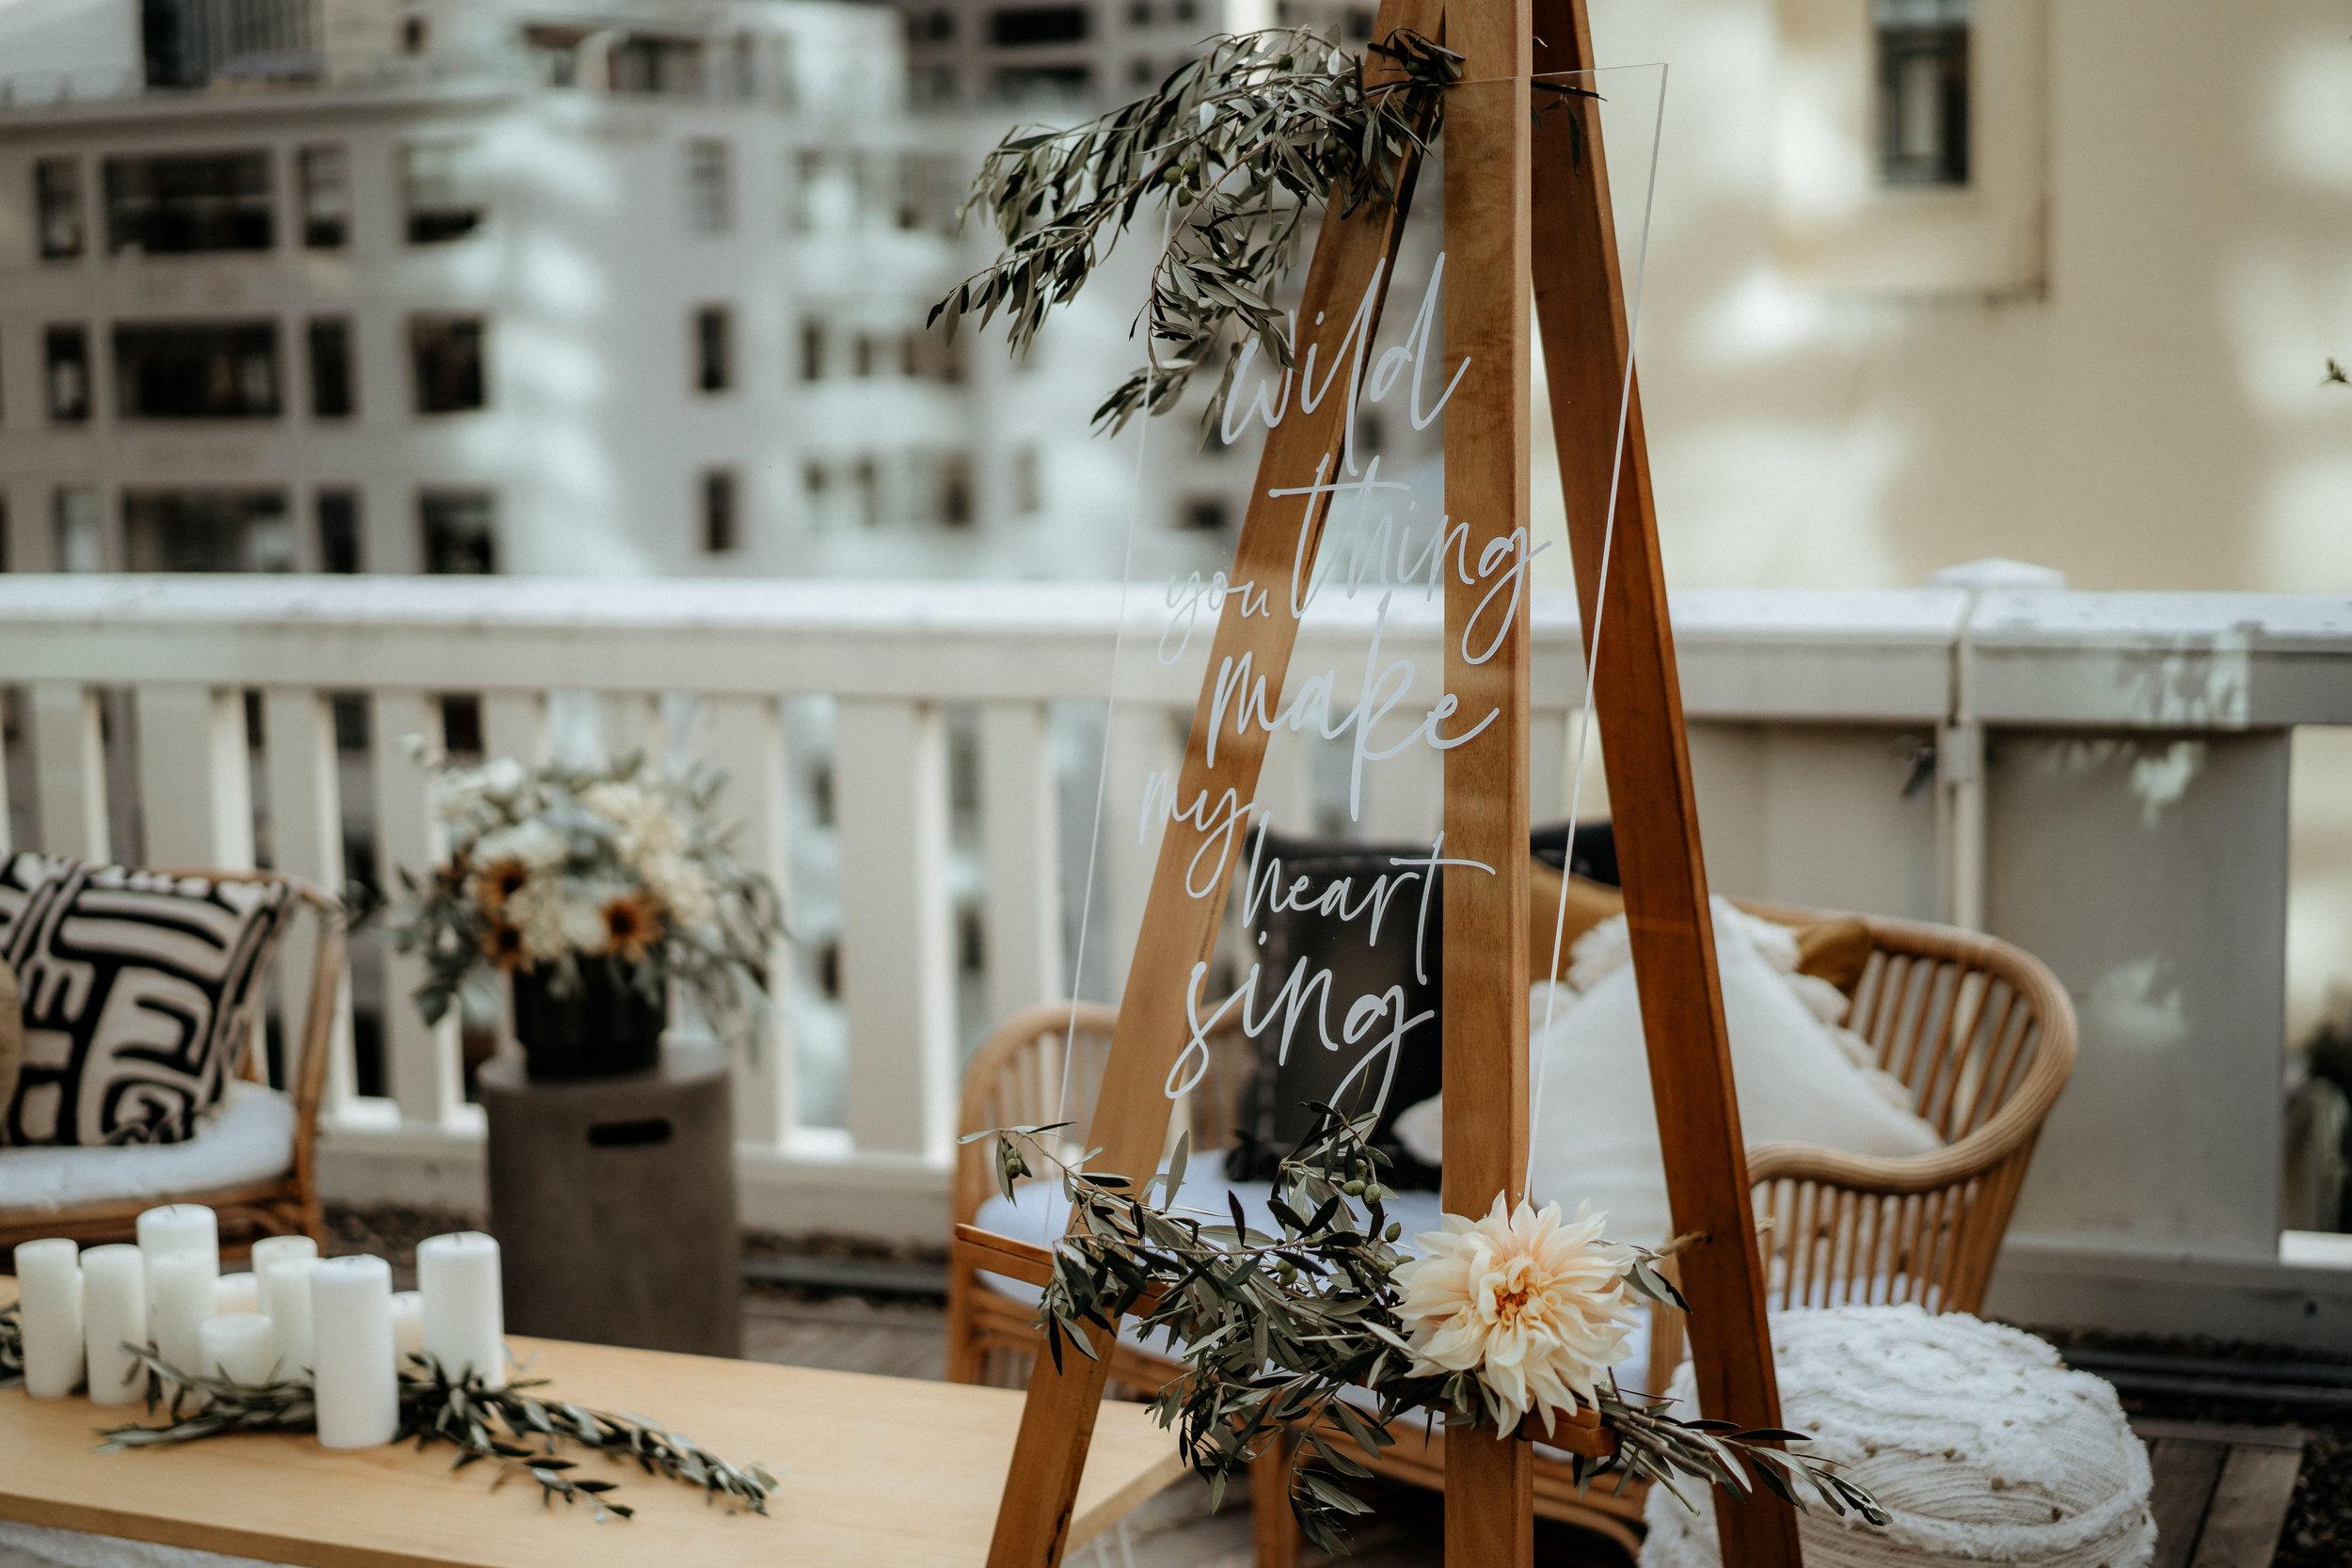 zandaphotography_Boheme_events_wedding_Auckland-82.jpg